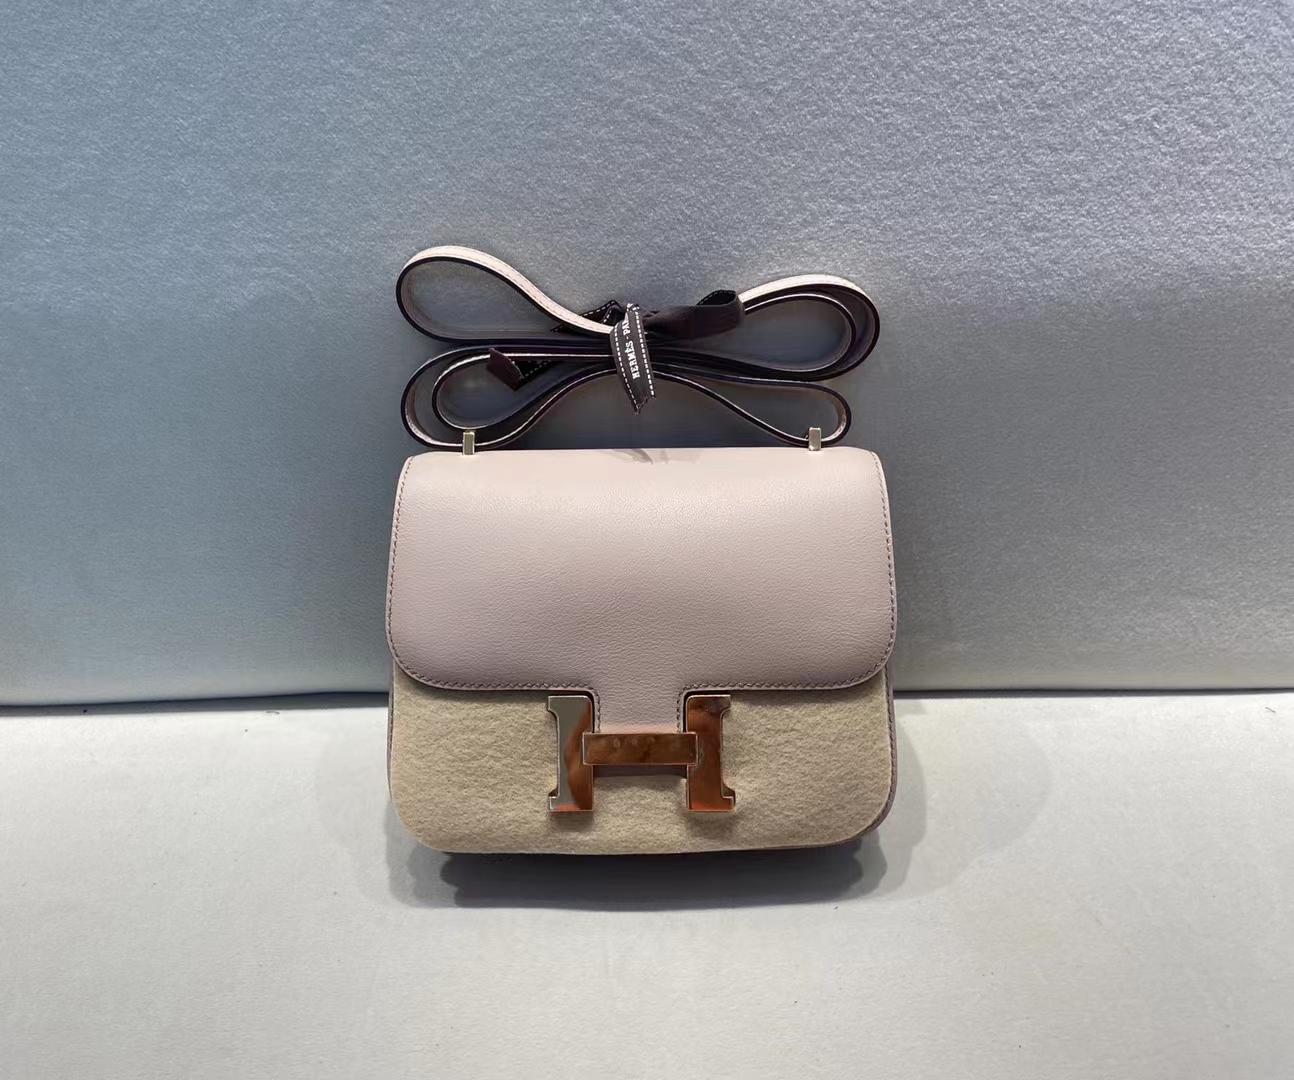 Hermès(爱马仕)Constance 空姐包 swift皮 P1 蔷薇粉 内拼 3Q 樱花粉 18cm 顶级品质